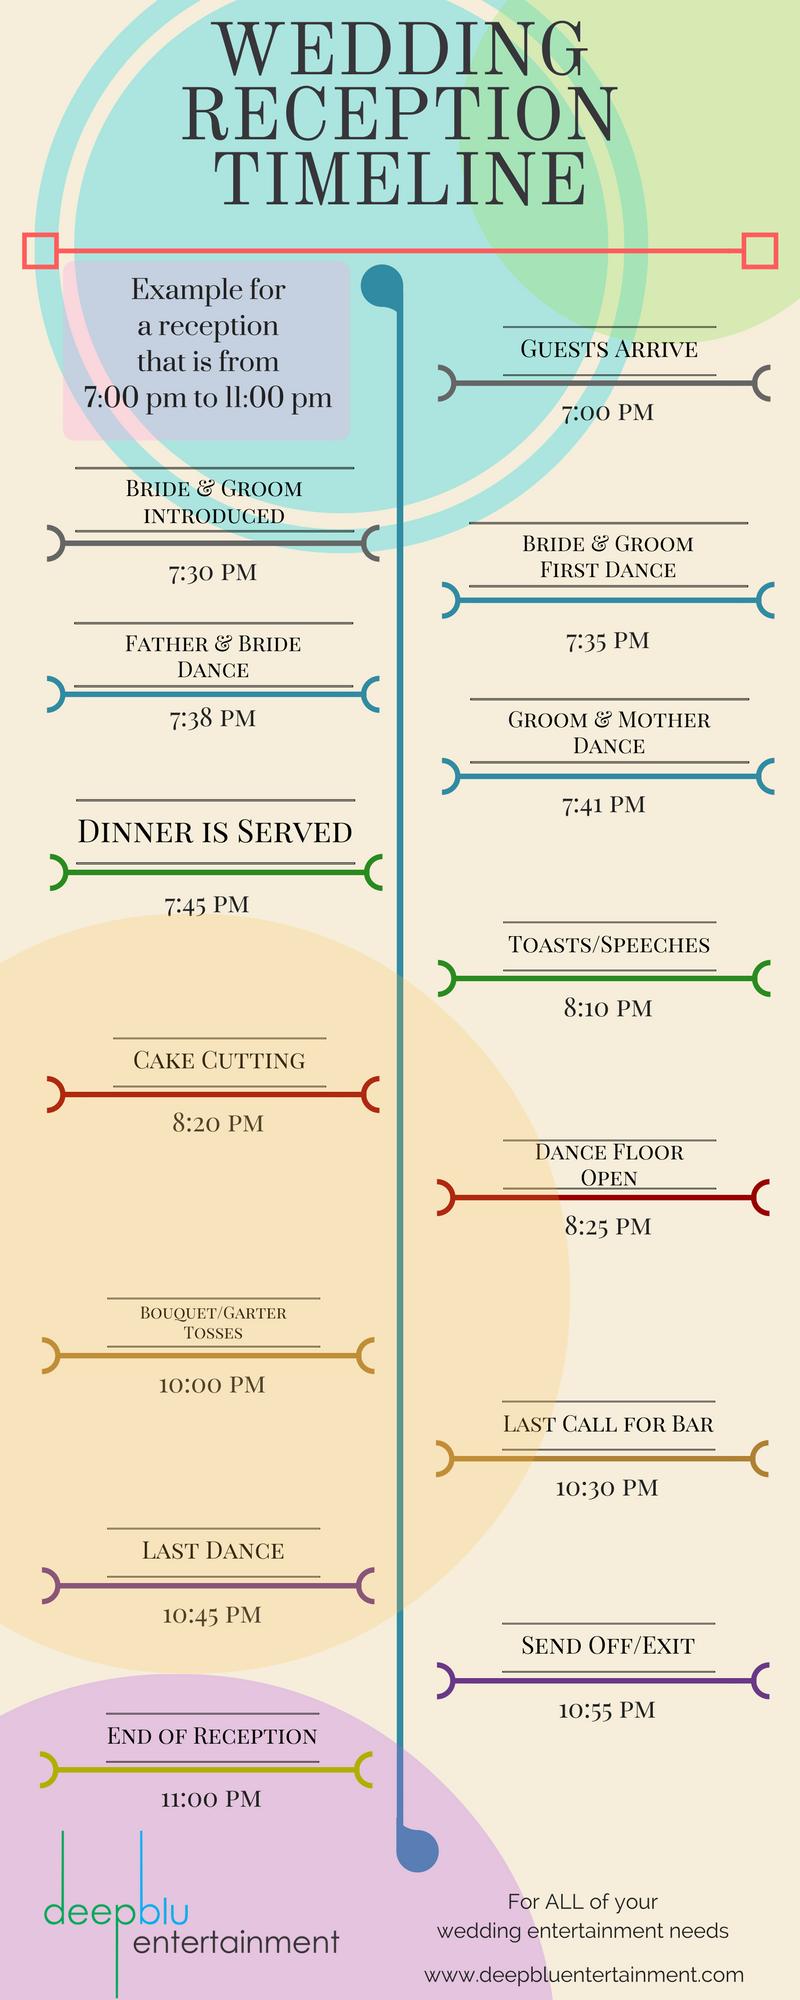 Fashion Show Itinerary Sample